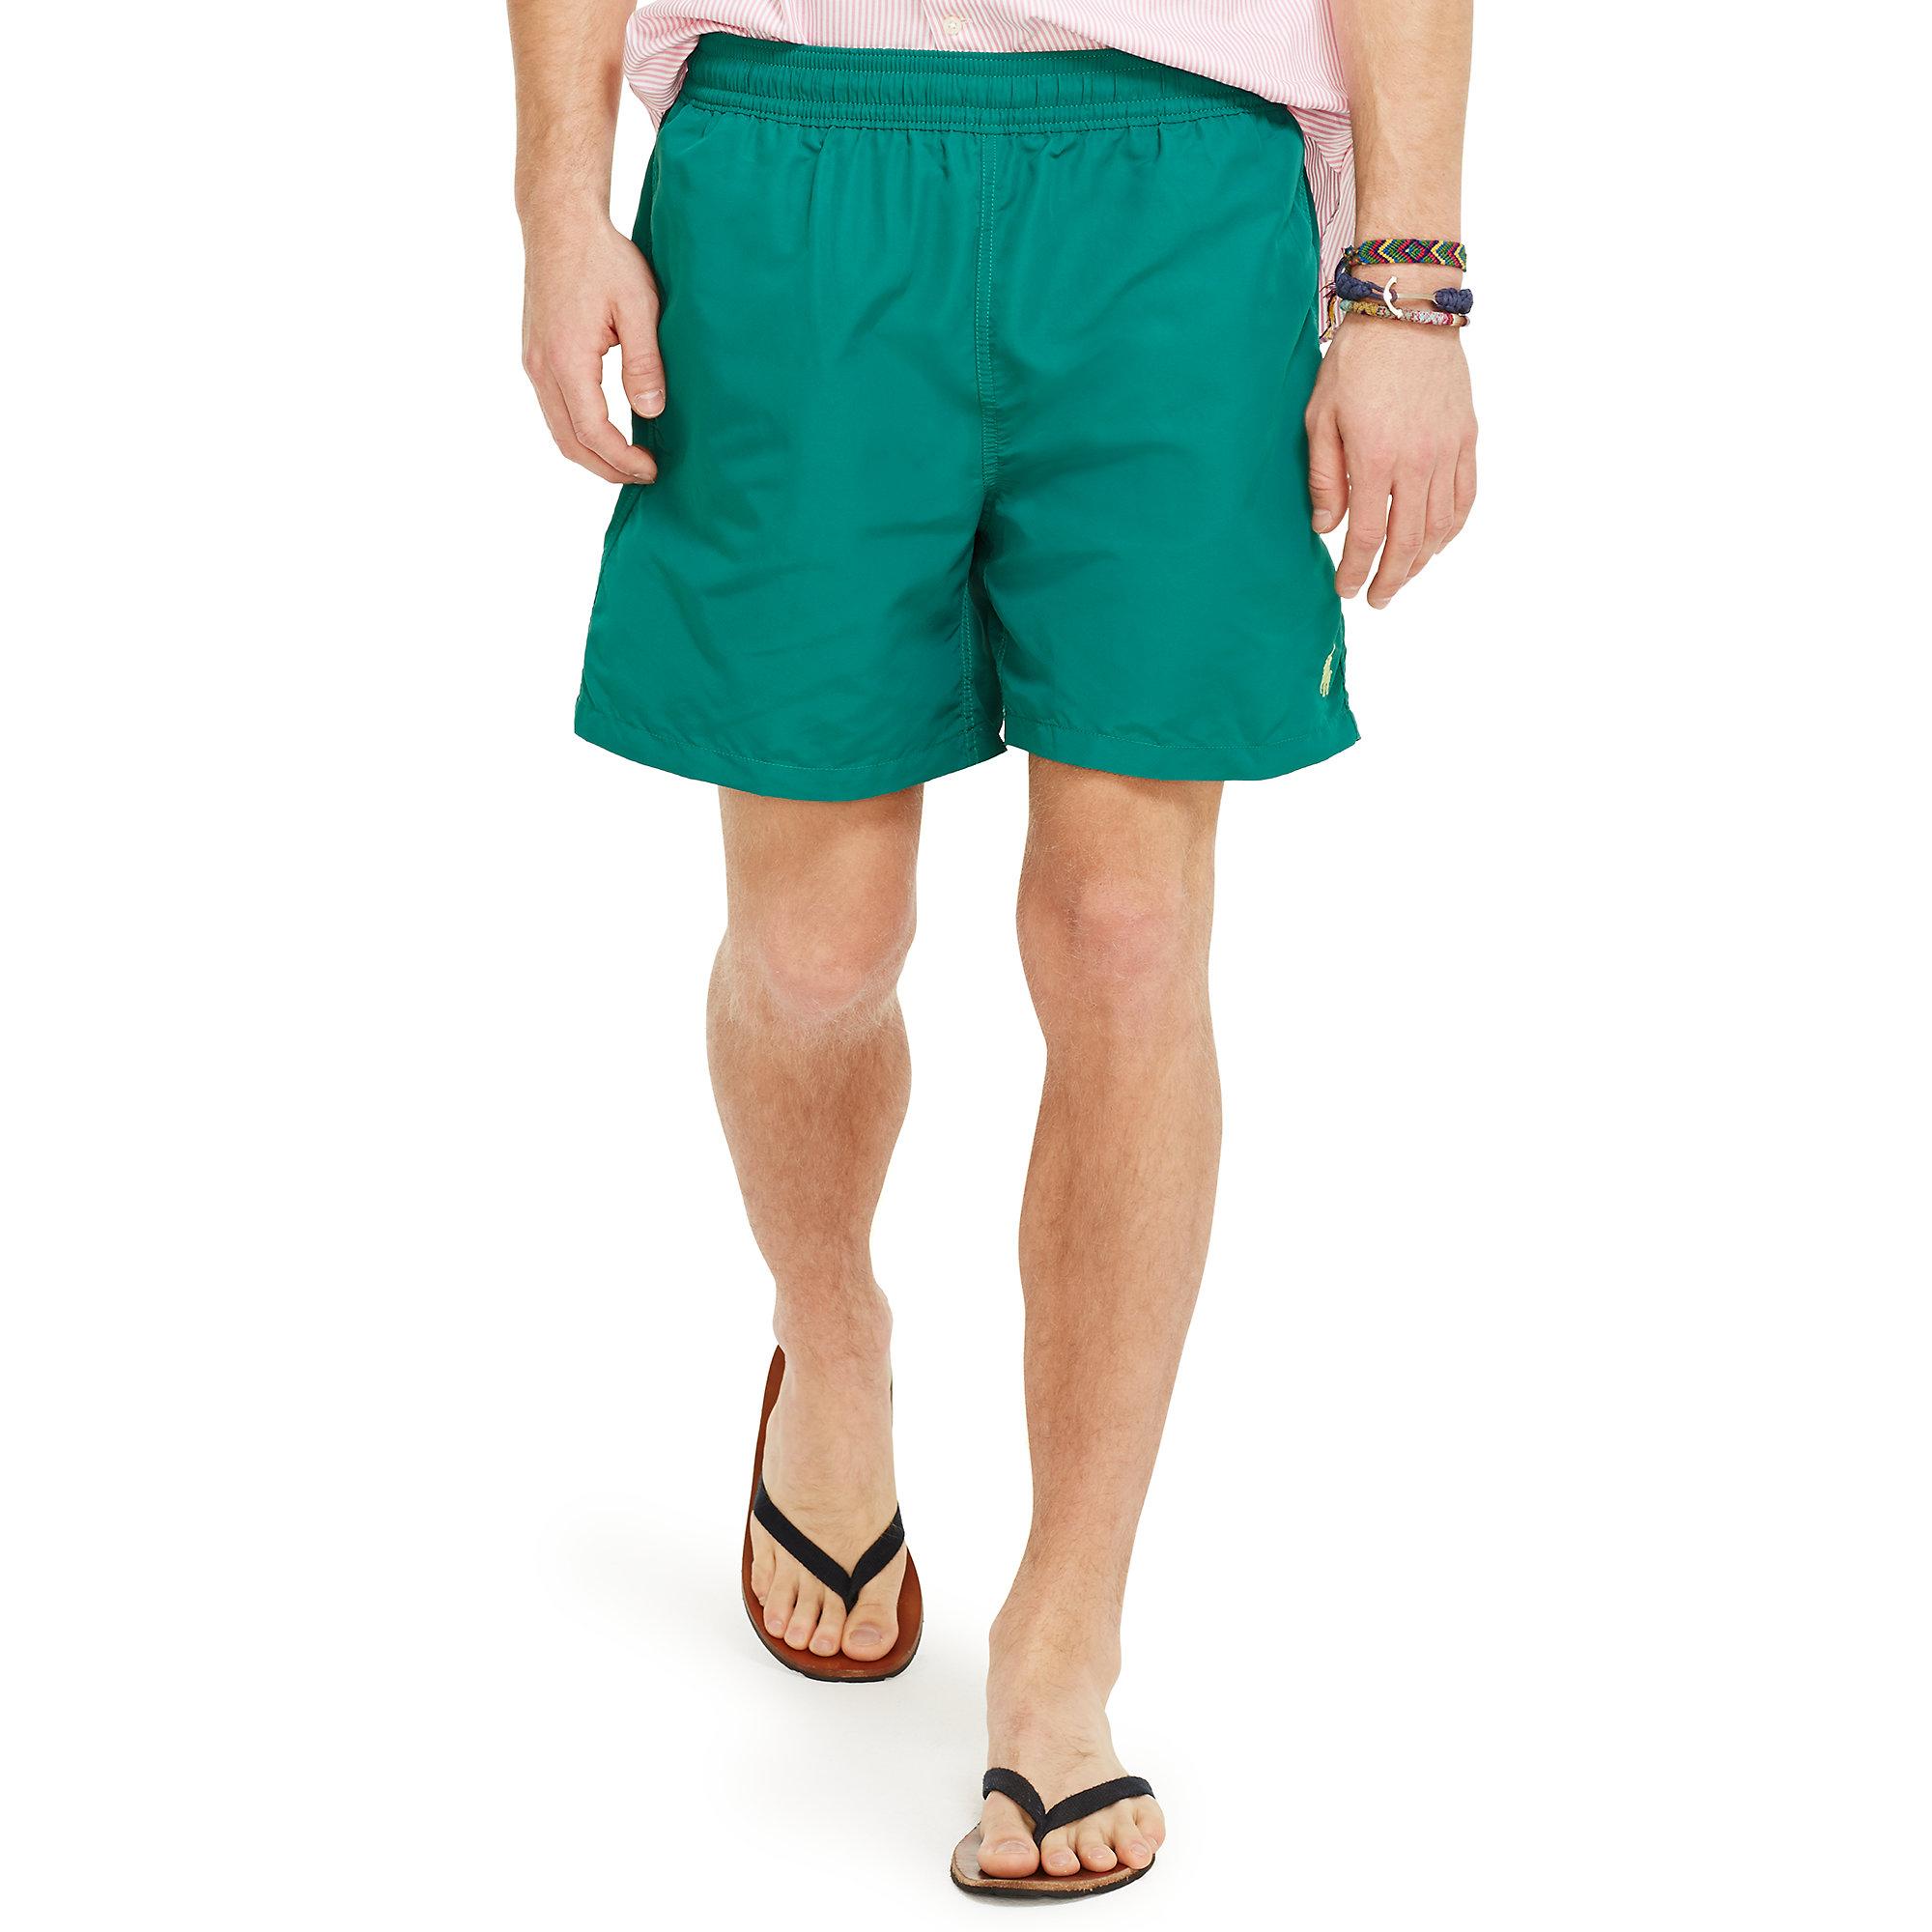 1da199d7ba ... switzerland lyst polo ralph lauren 6 solid hawaiian swim trunk in green  for men 55d43 62789